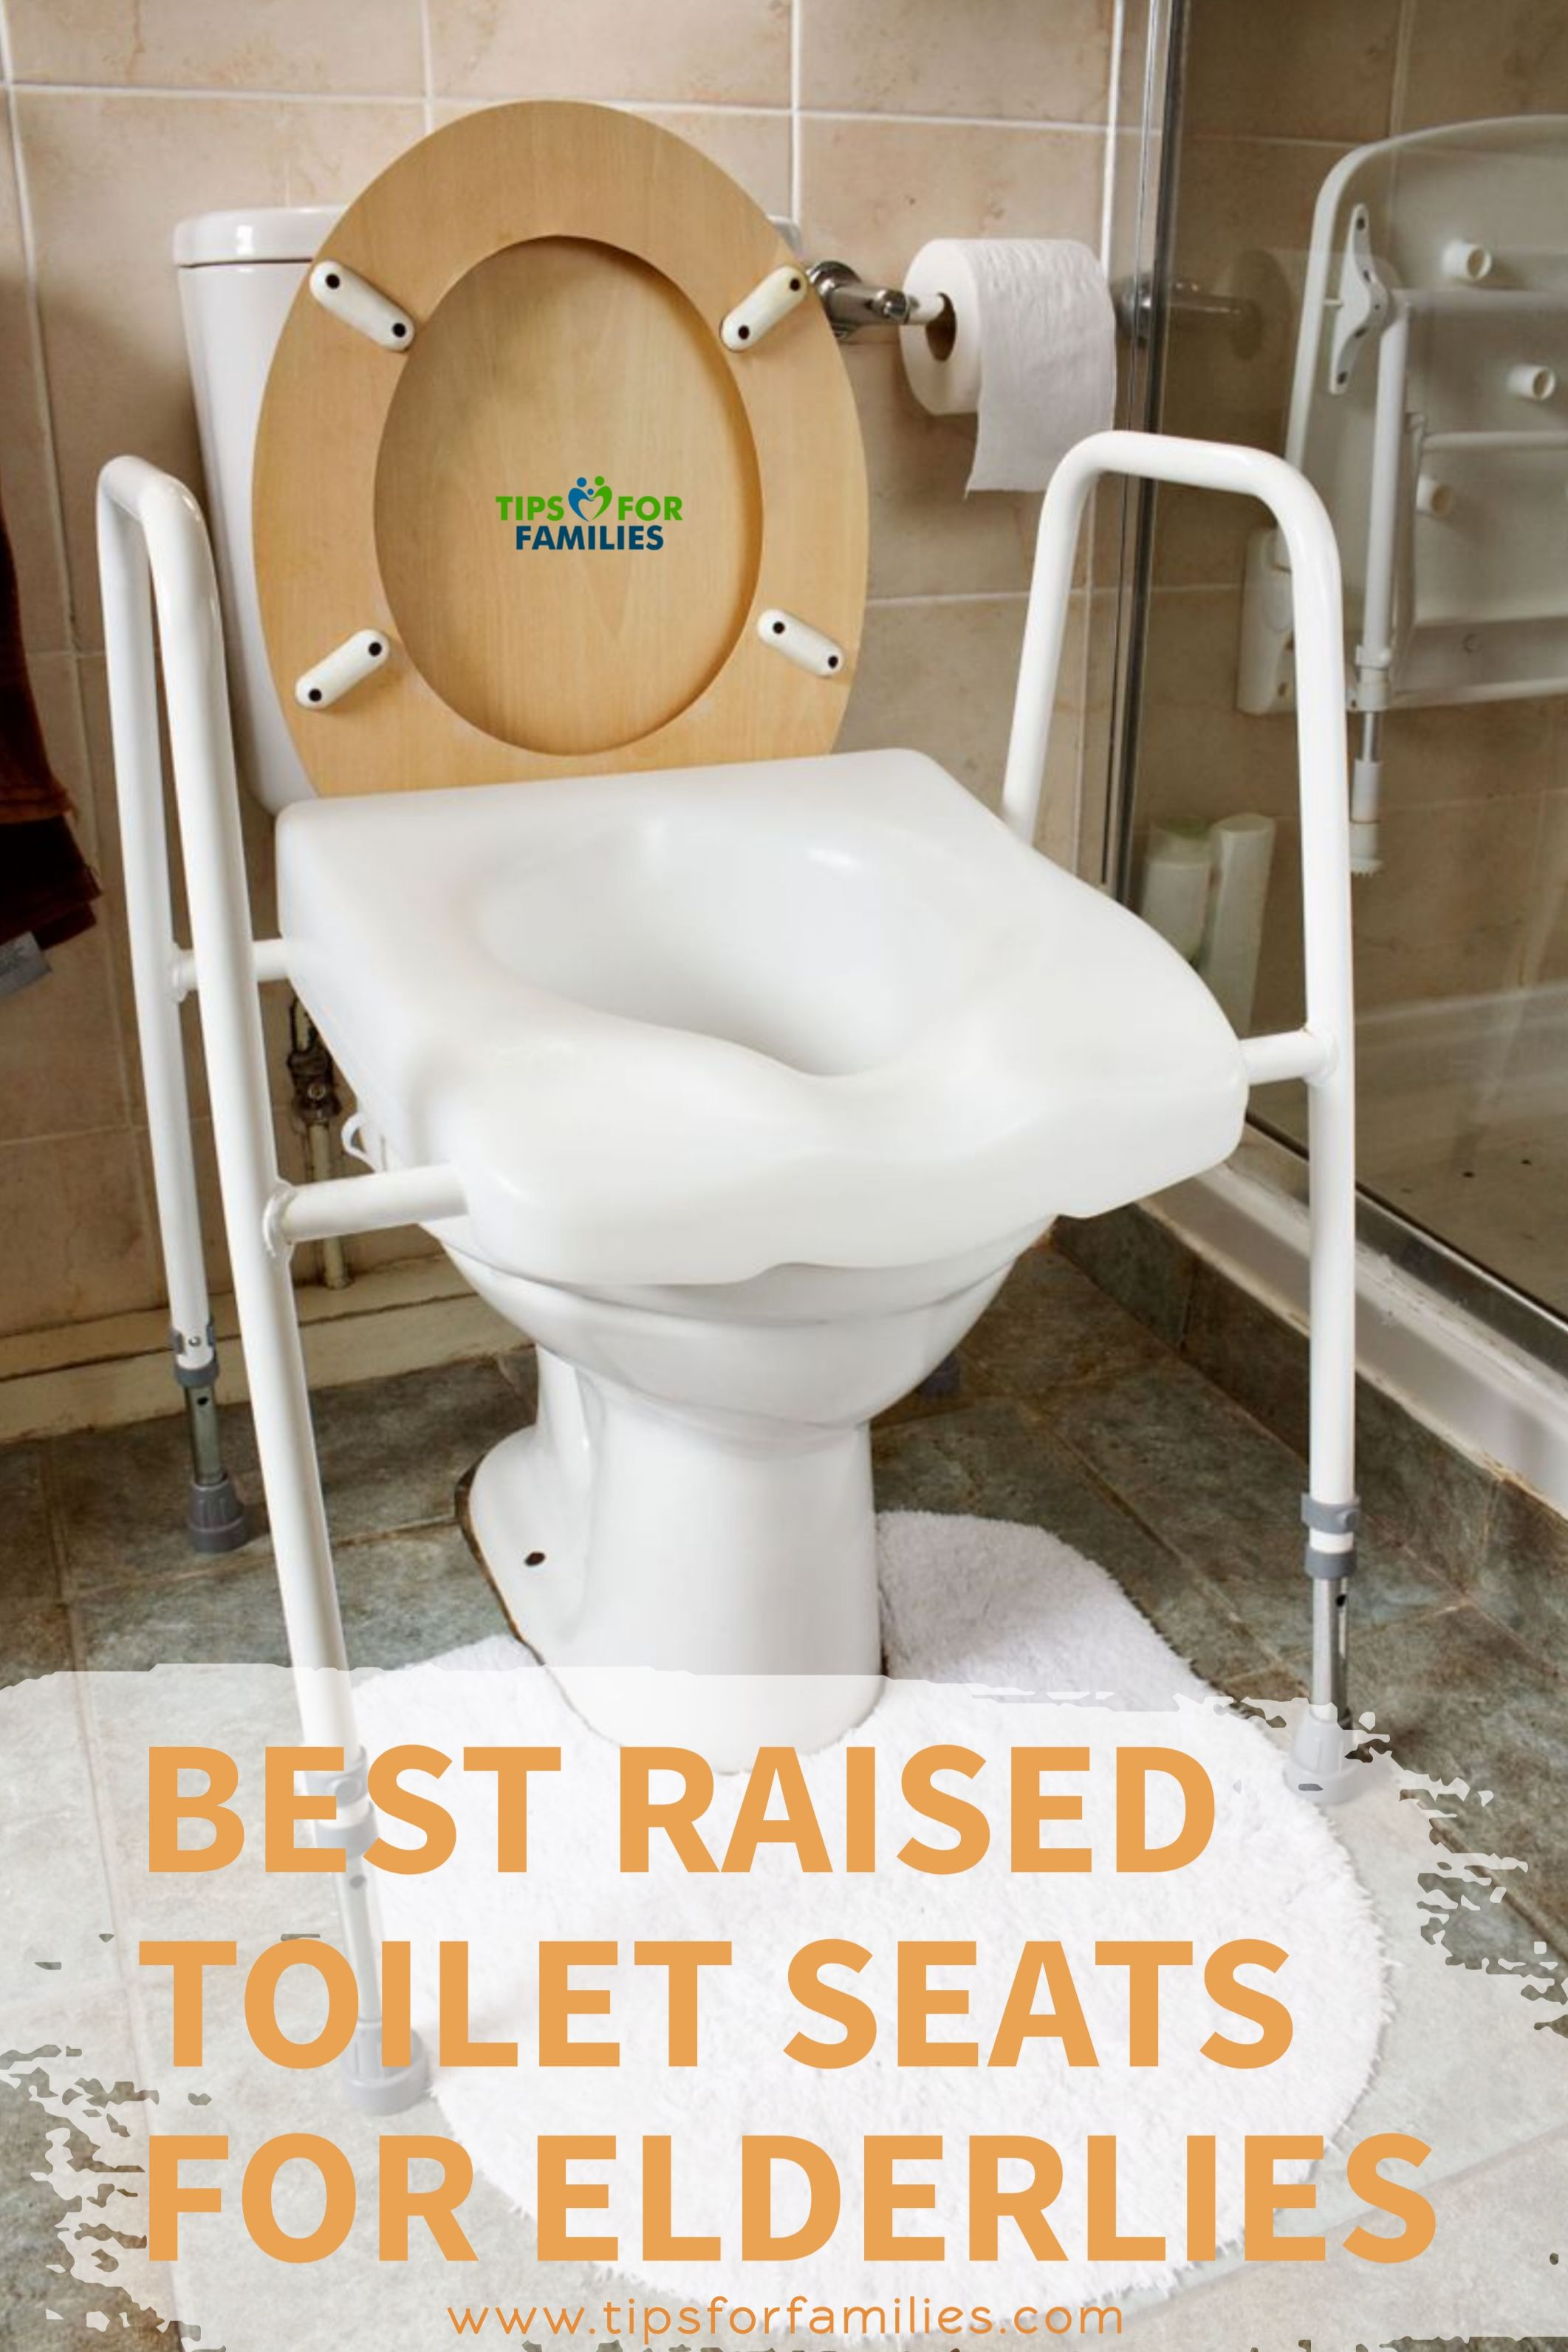 The 5 Best Raised Toilet Seats For Elderlies In 2020 Elderly Care Toilet Seat Elderly